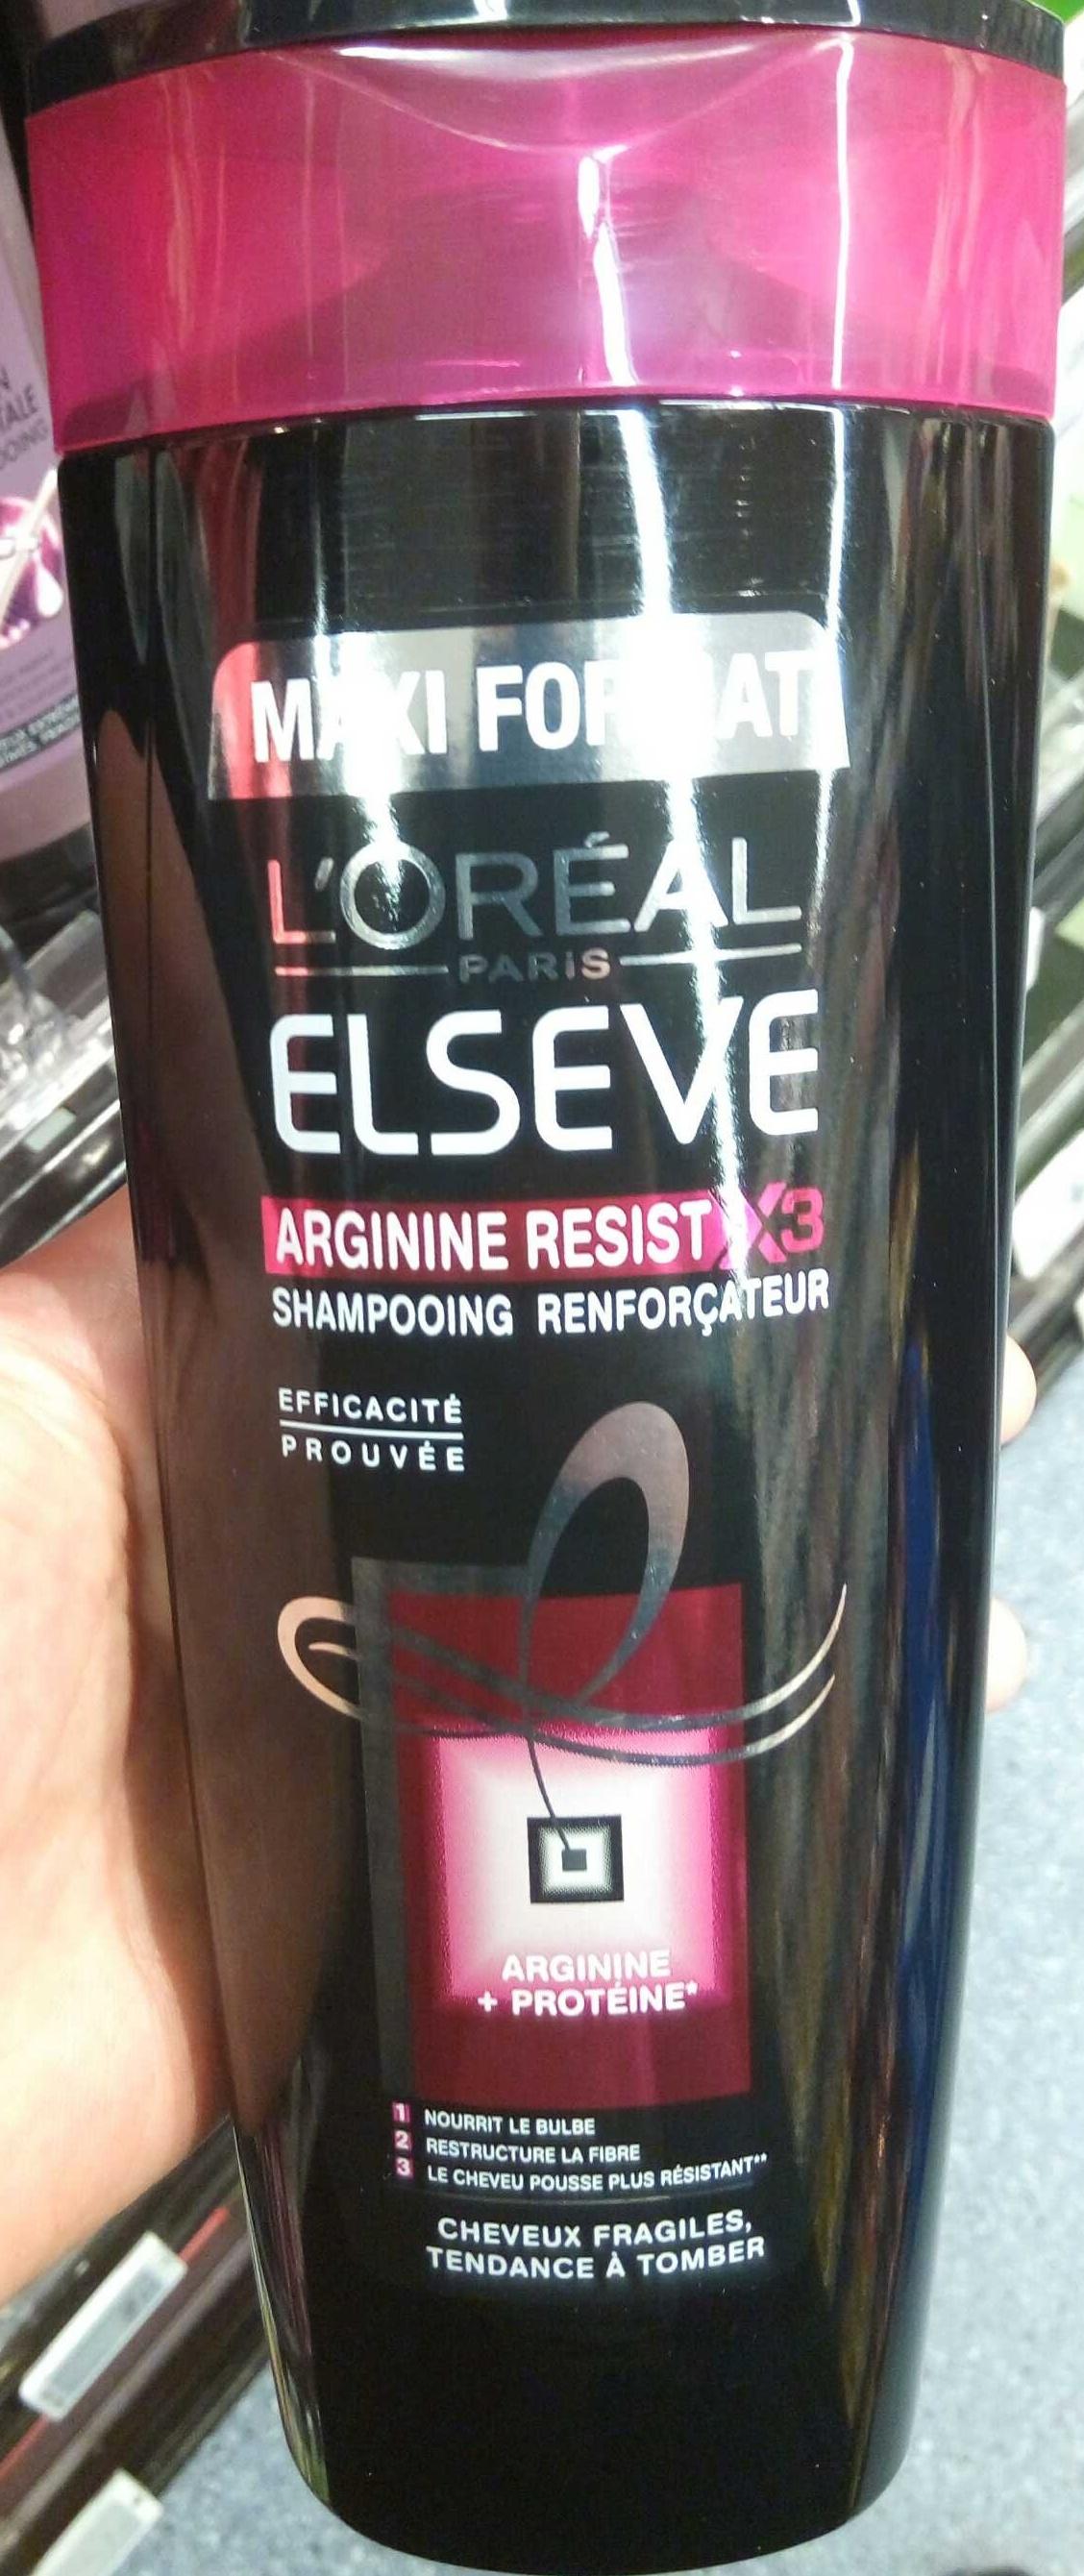 Elseve Arginine Resist X3 (Maxi Format) - Product - fr